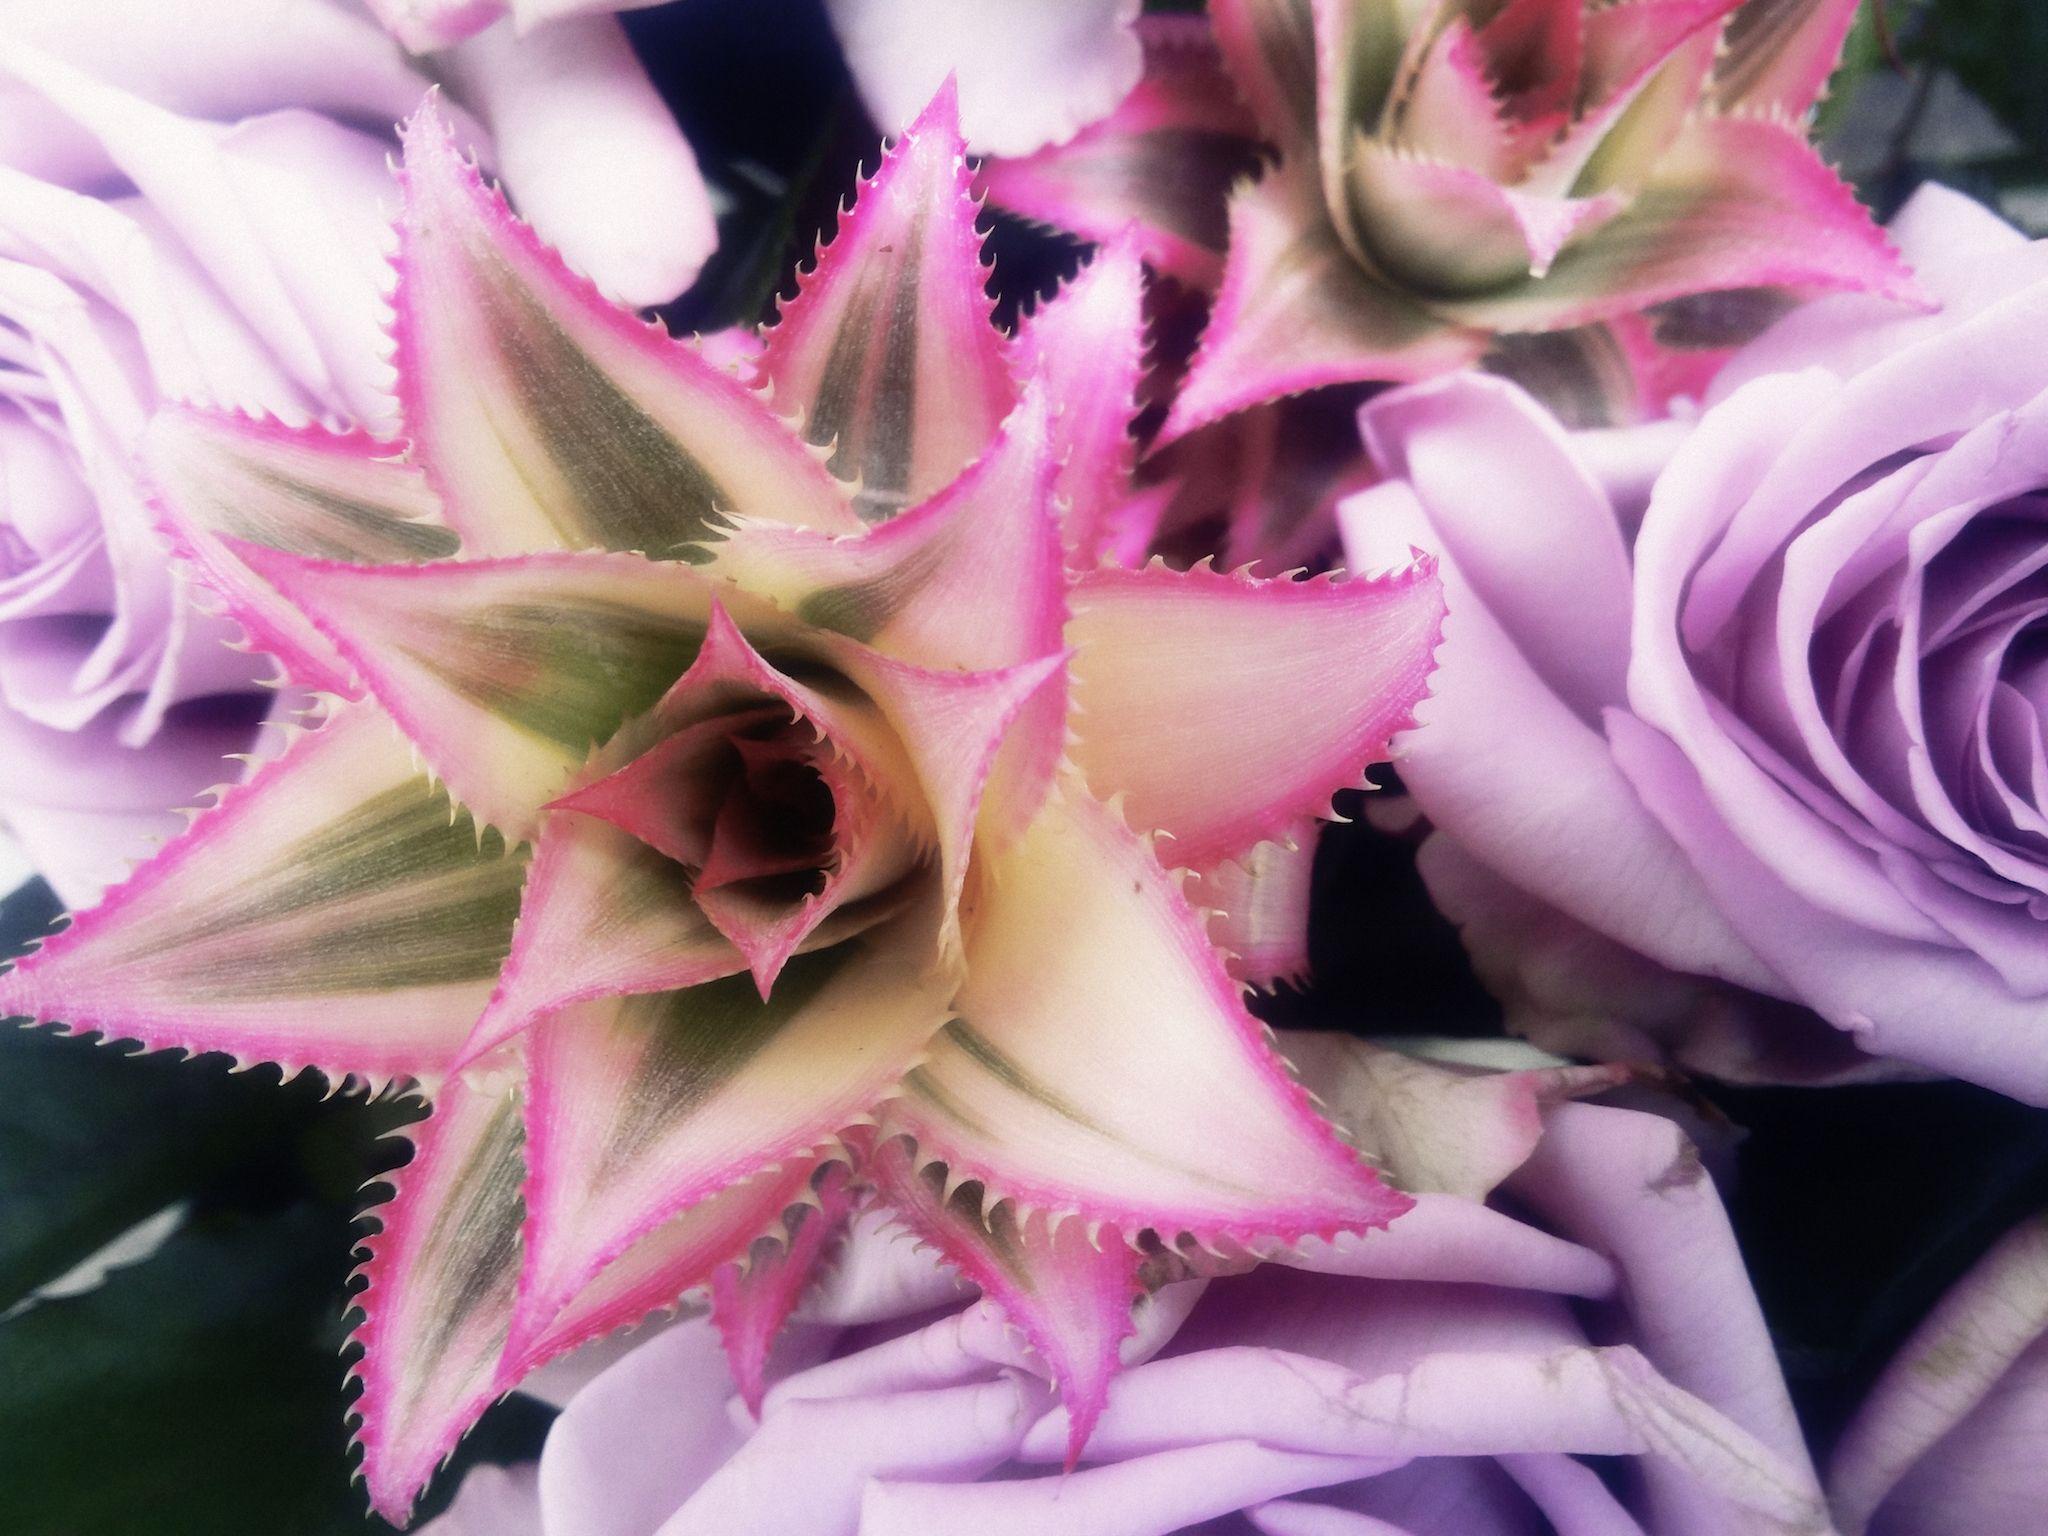 #magic #pineapple & #violette #roses a sunday: http://alicewonderland2.blogspot.co.uk/2016/04/a-faerie-tales-of-violette-sunday.html